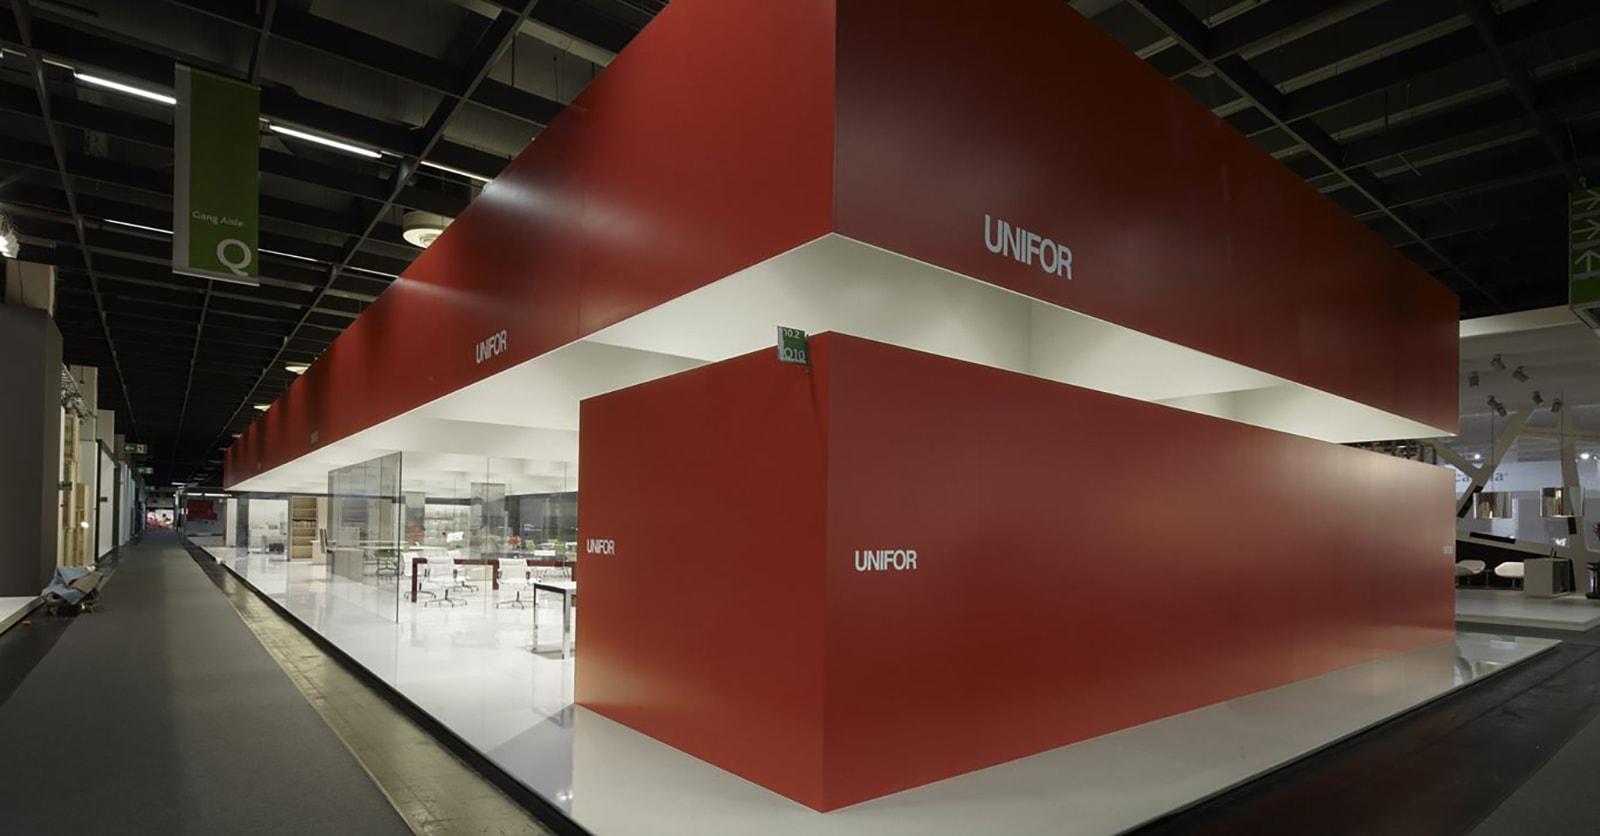 Unifor06